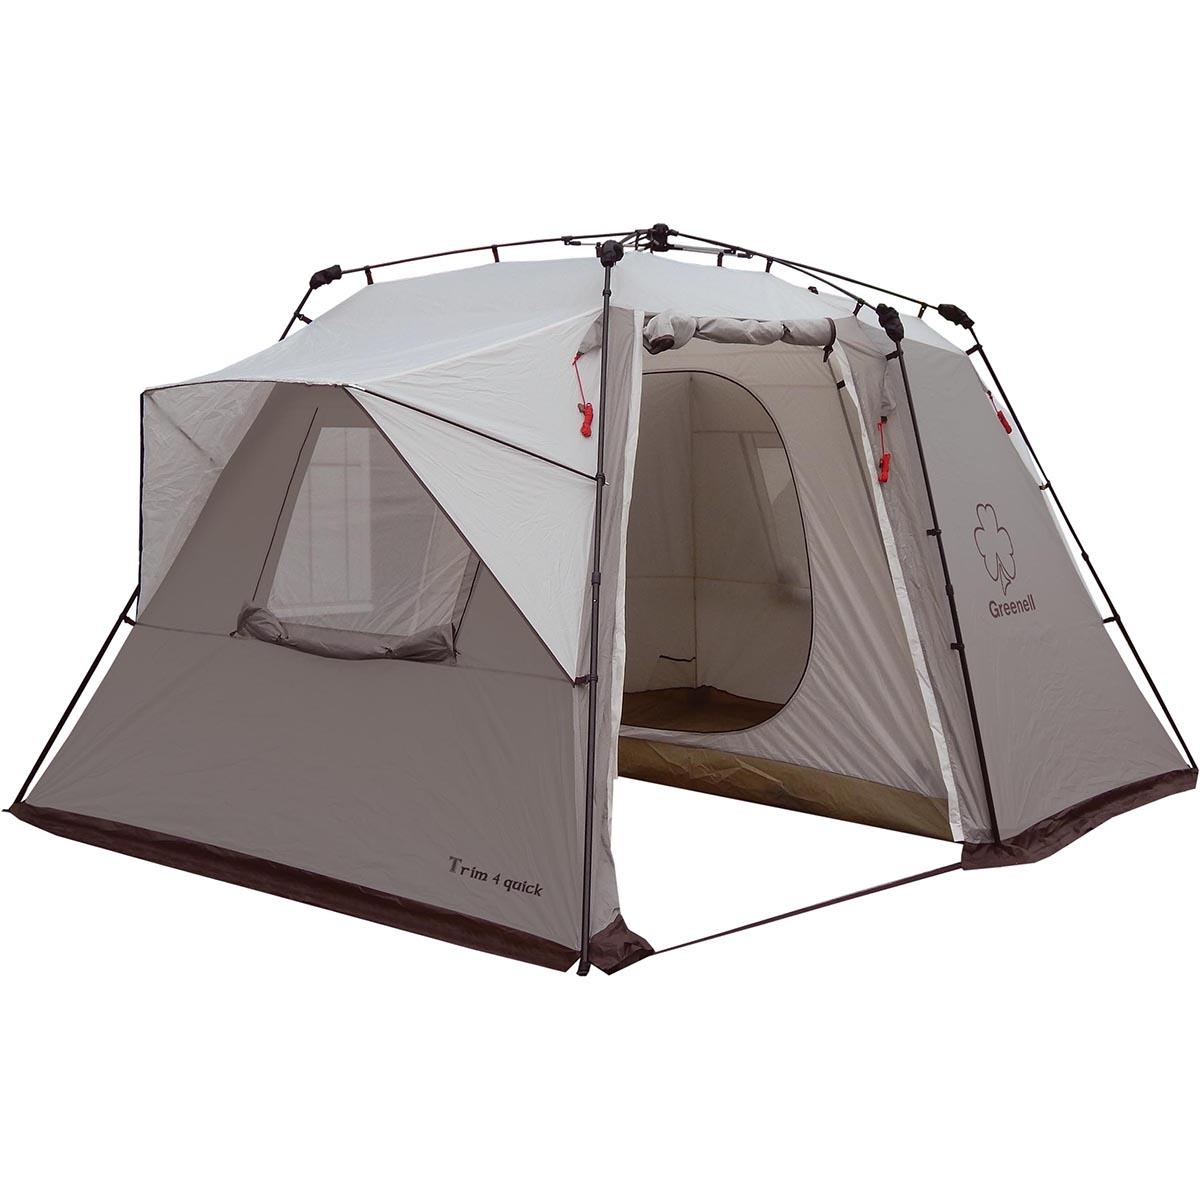 Палатка-автомат Greenell Трим 4 квик, цвет: коричневый палатка greenell виржиния 6 плюс green